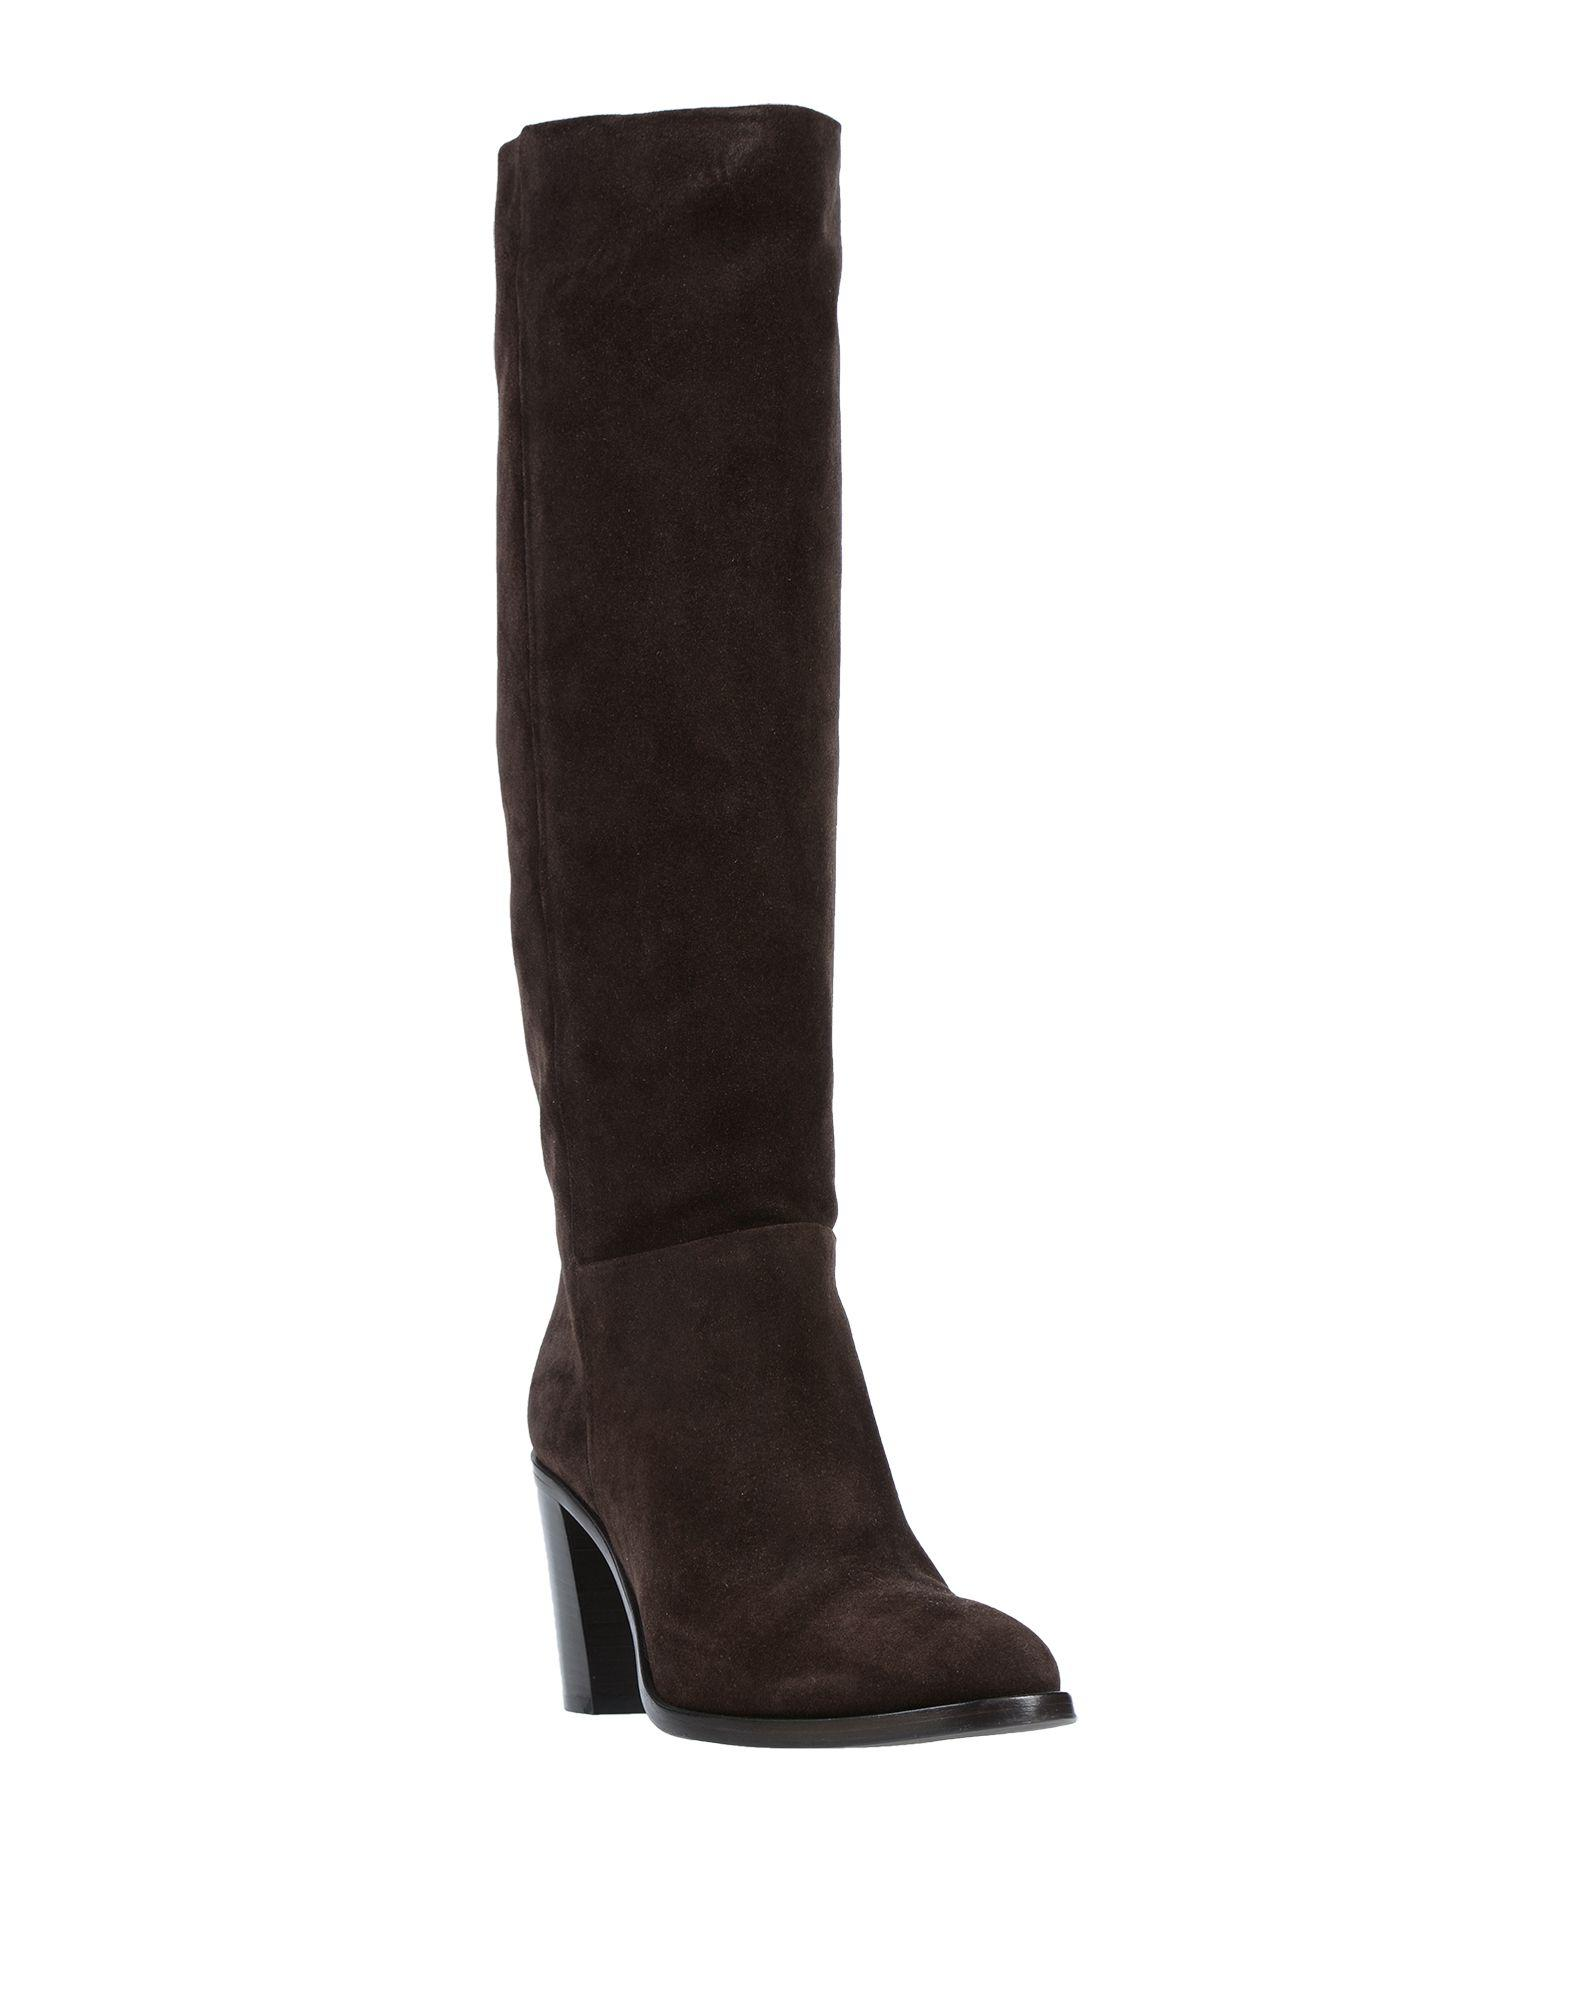 Enrico Antinori black leather boots,